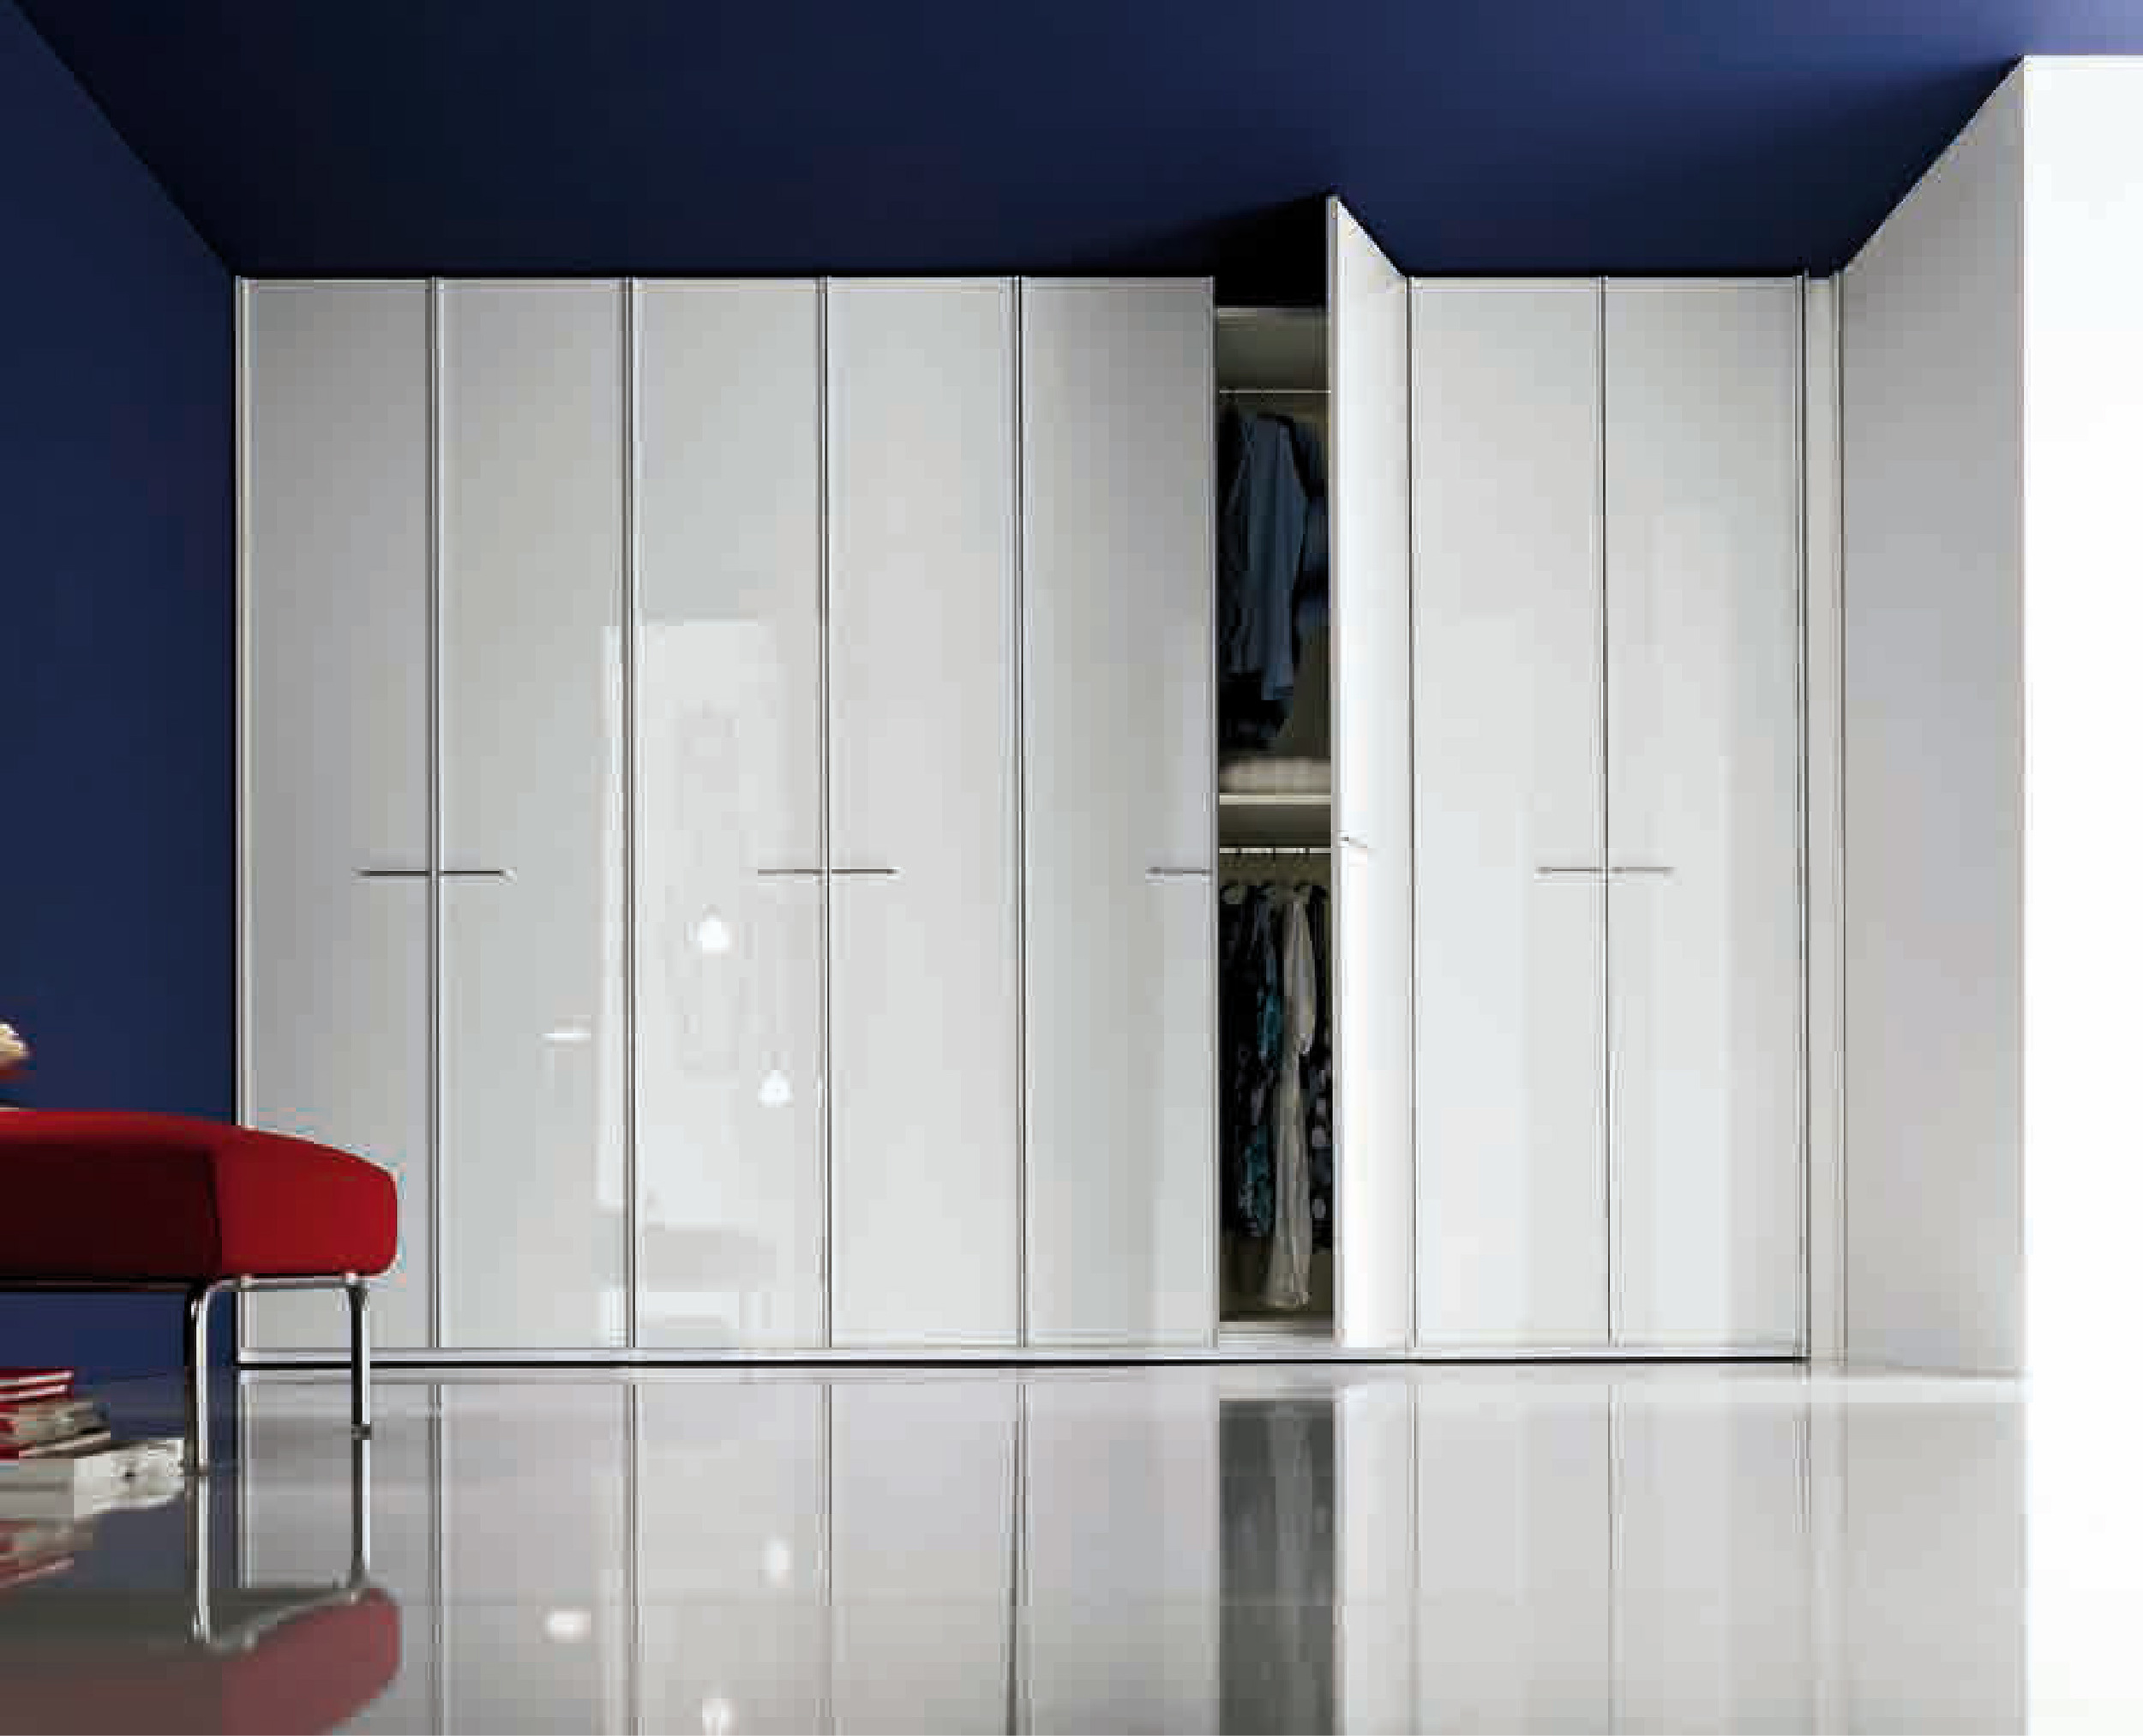 wardrobes-05.jpg